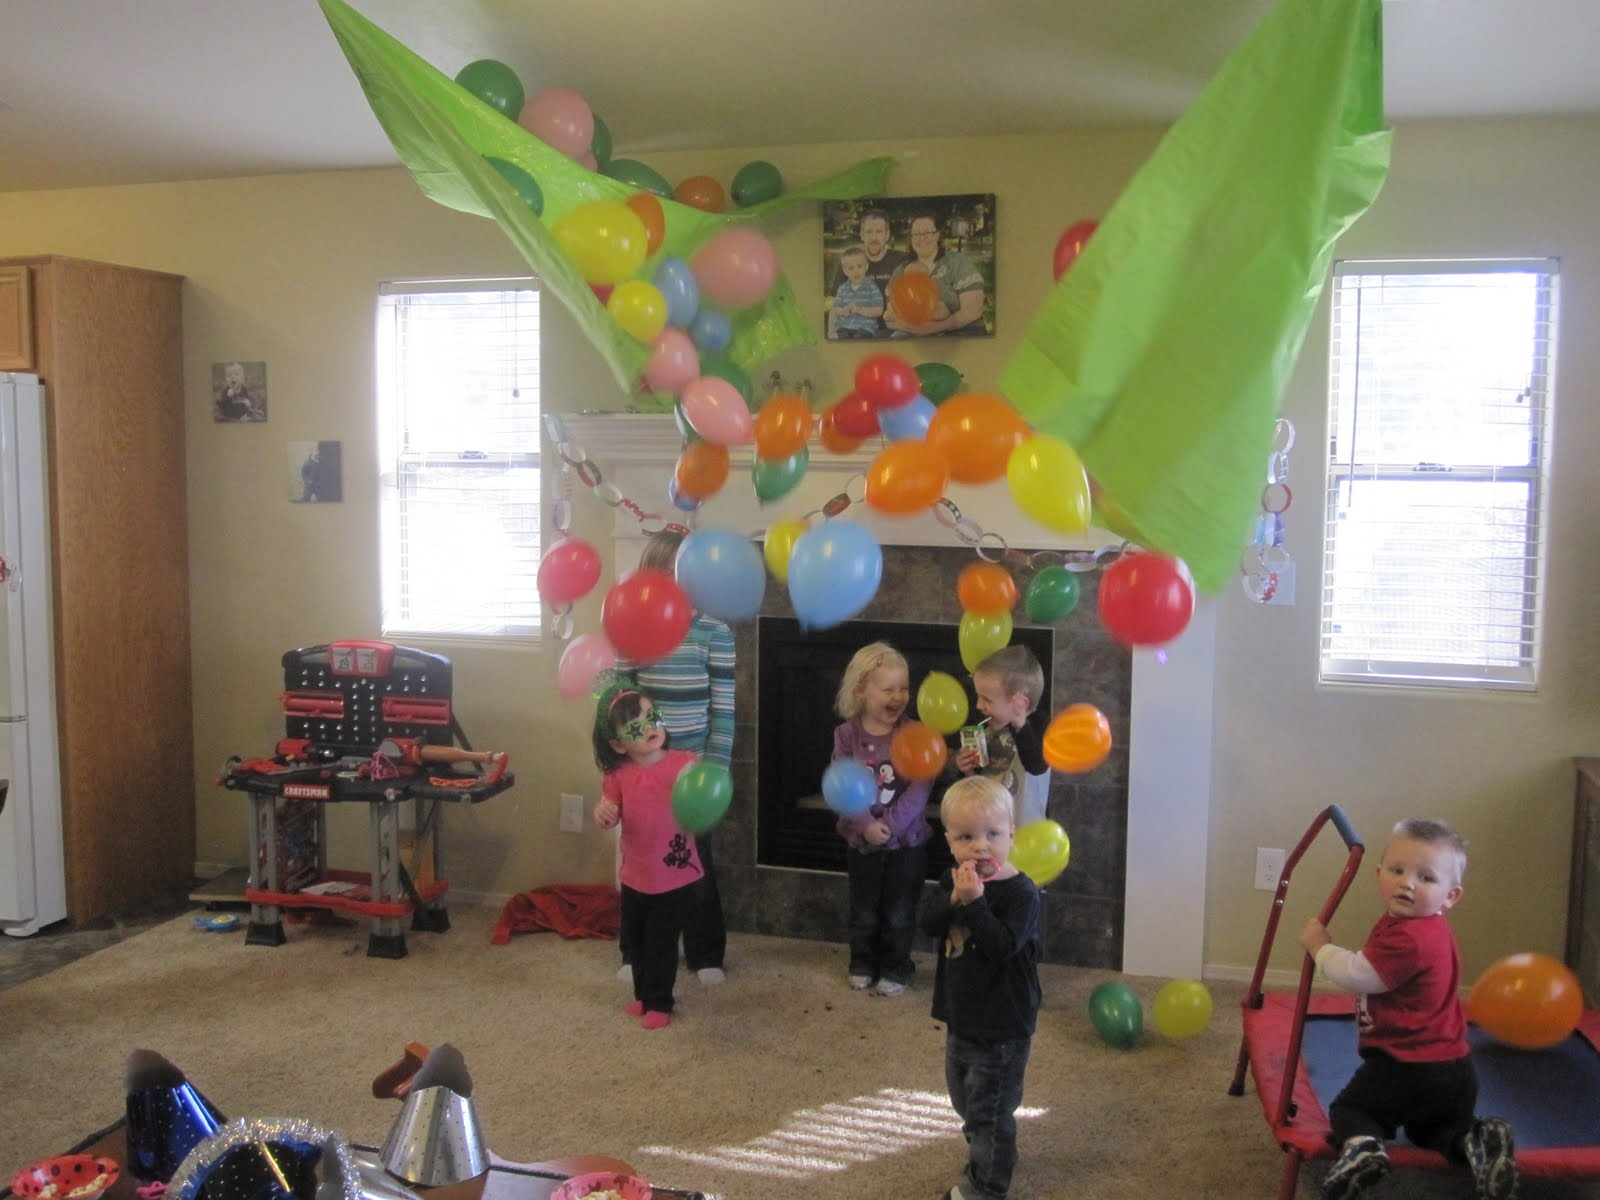 45+ Fun and Creative Ways to Use Balloons --> DIY Balloon Drop